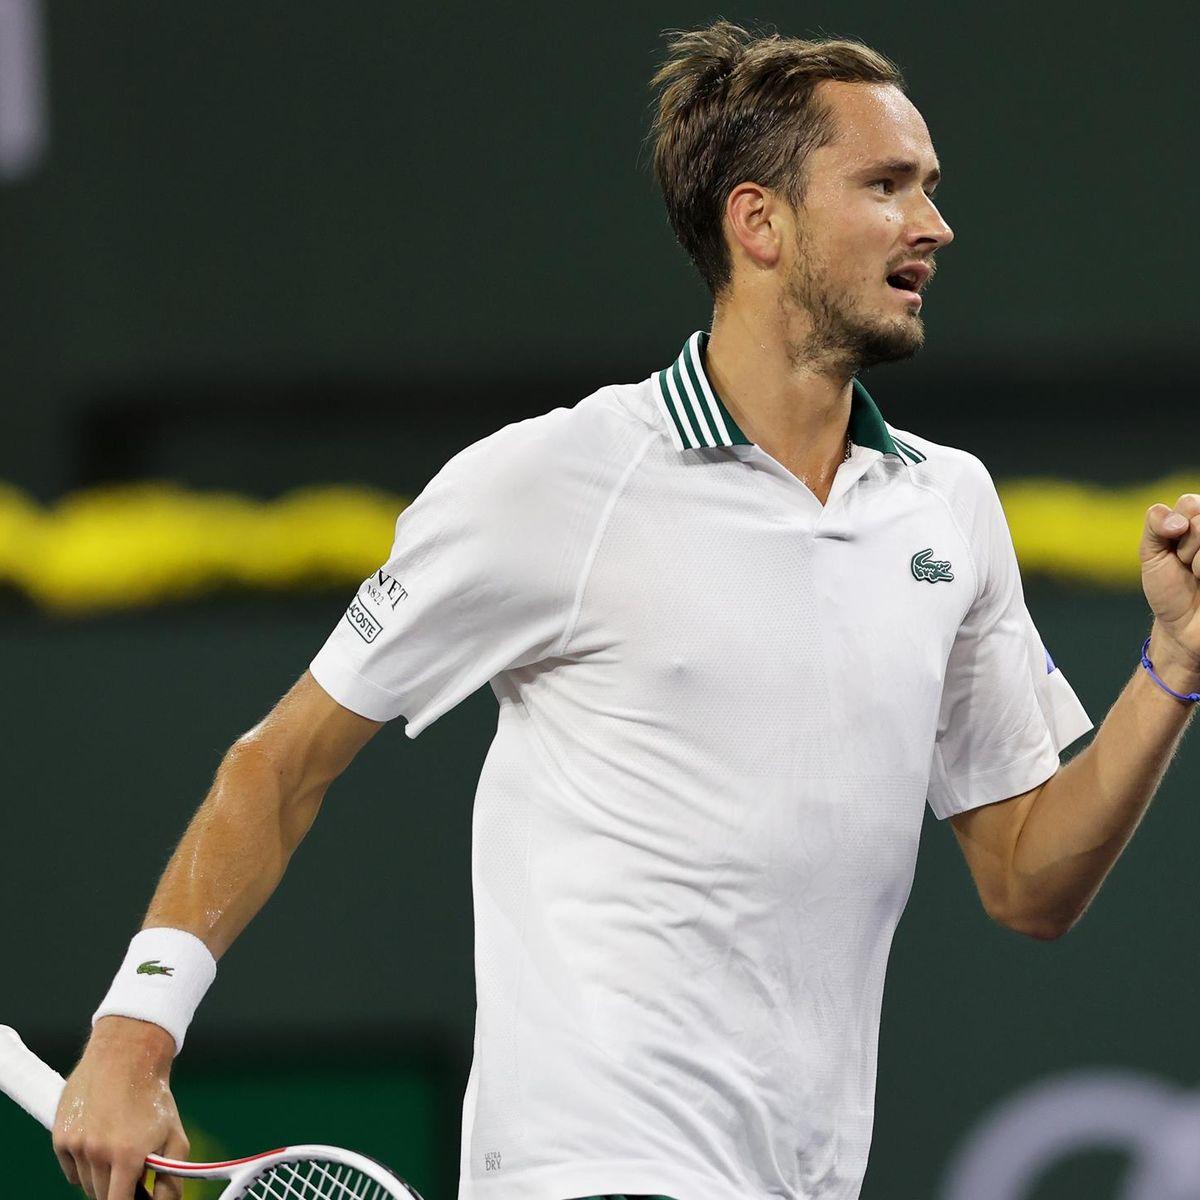 Daniil Medvedev siegt gegen Lokalmatador Mackenzie McDonald in Indian Wells  - Die Highlights - Tennis Video - Eurosport